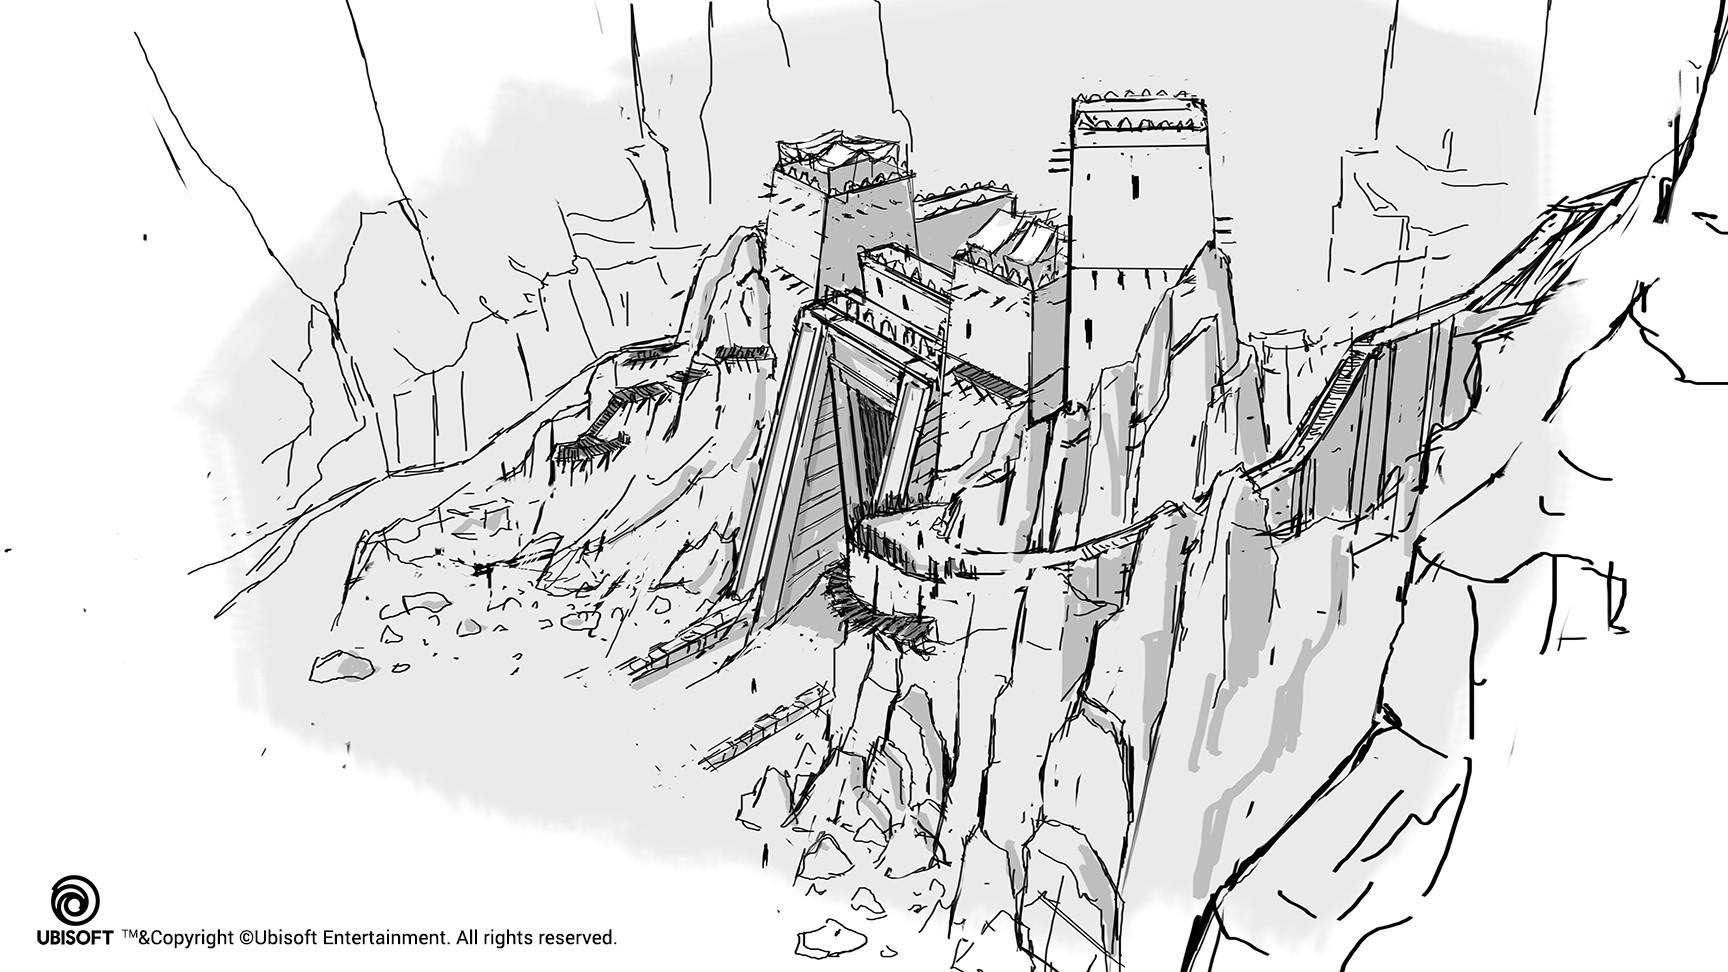 eddie-bennun-ace-env-fortification-gate-lr-logo-eddiebenun